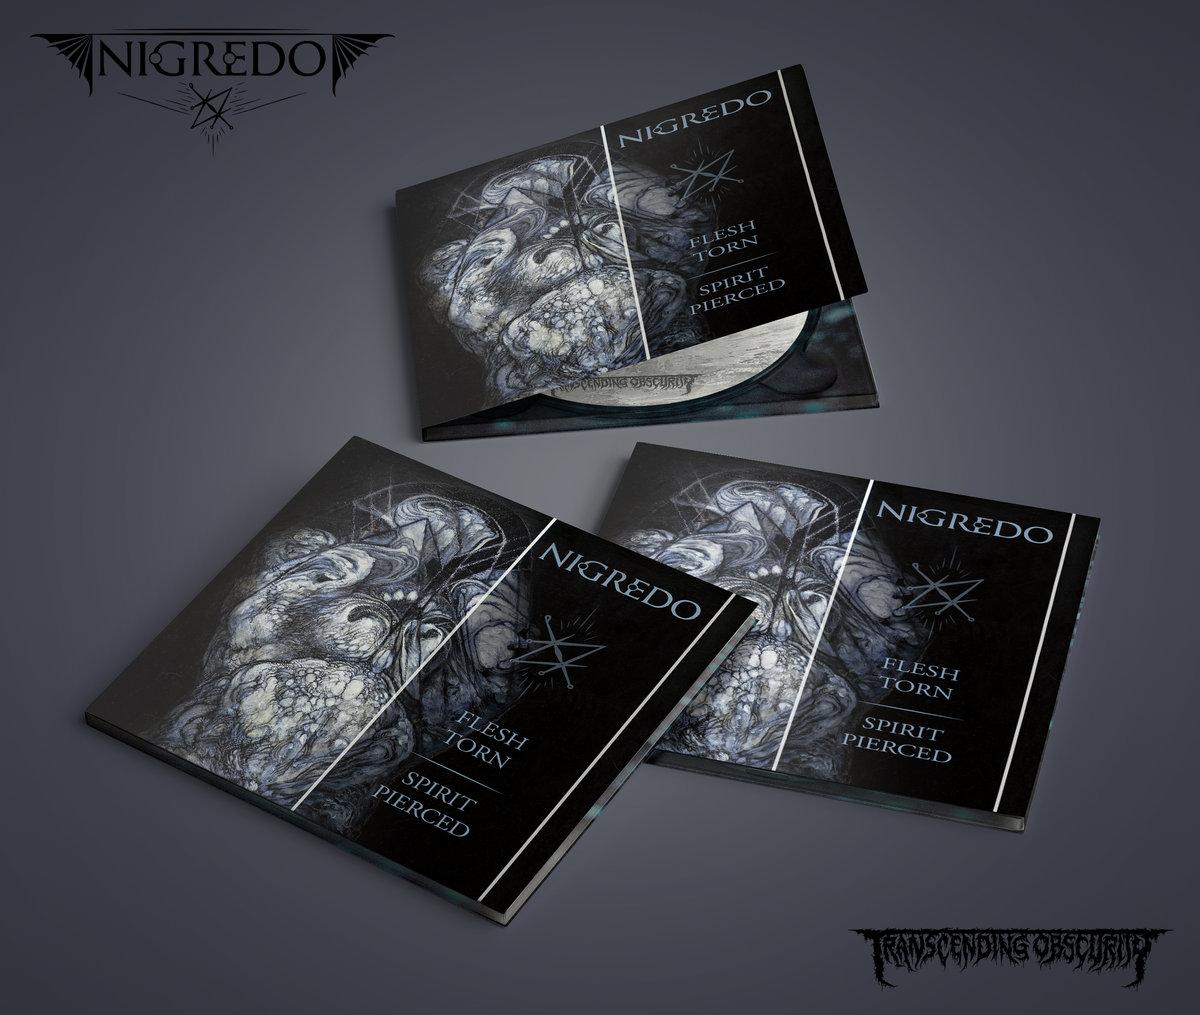 Flesh Torn - Spirit Pierced (Black Metal) | Nigredo